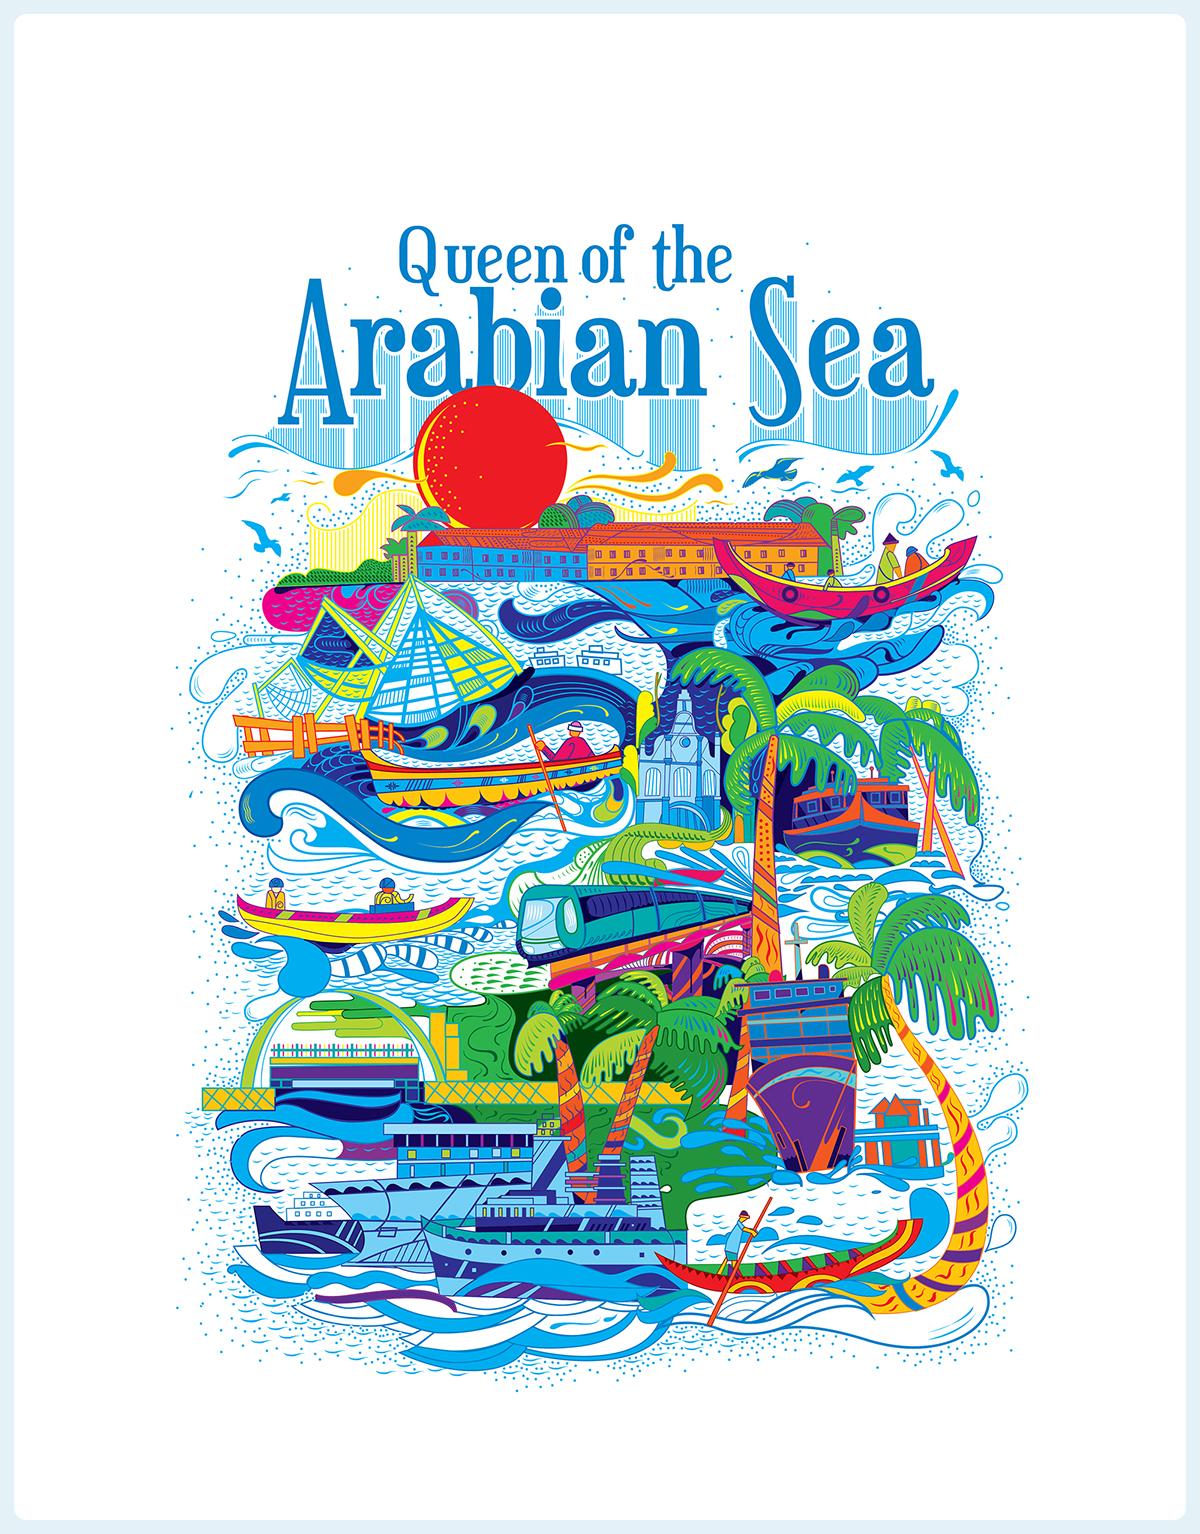 Kerala Blog Express - Trip of a Lifetime by Kerala Tourism   Queen of Arabian Sea by Stark Communications Pvt Ltd